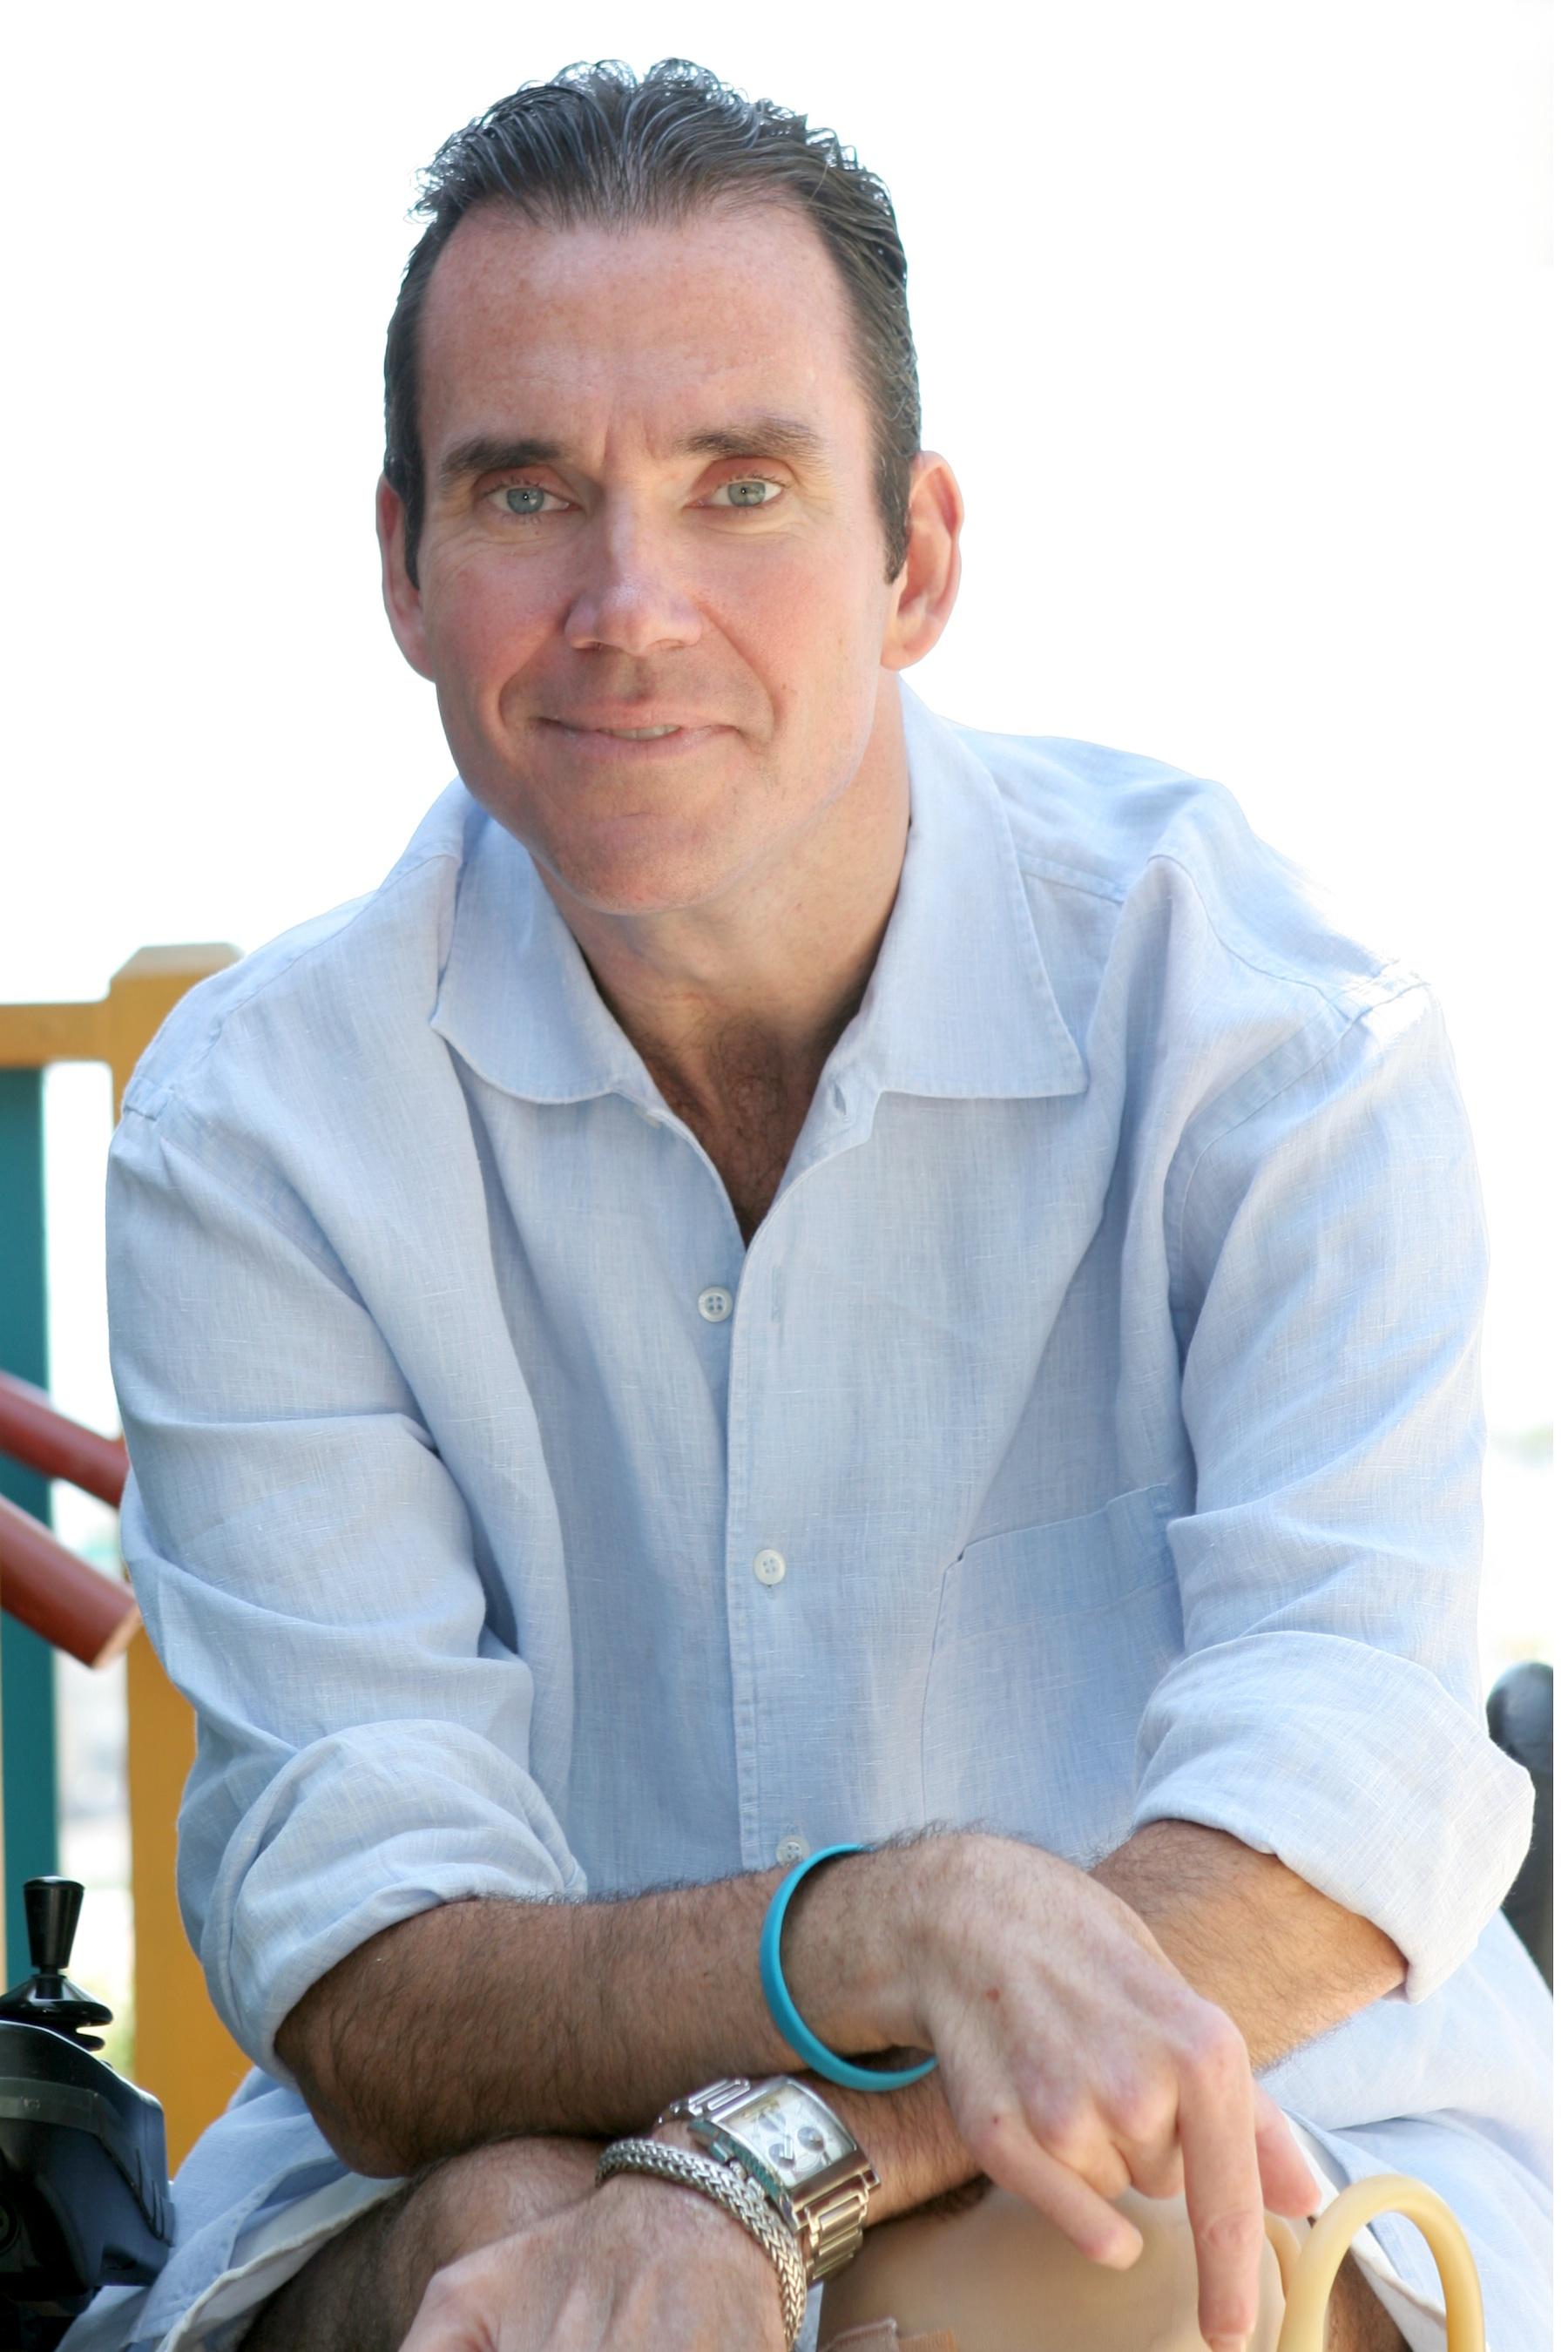 The amazing Jim MacLaren